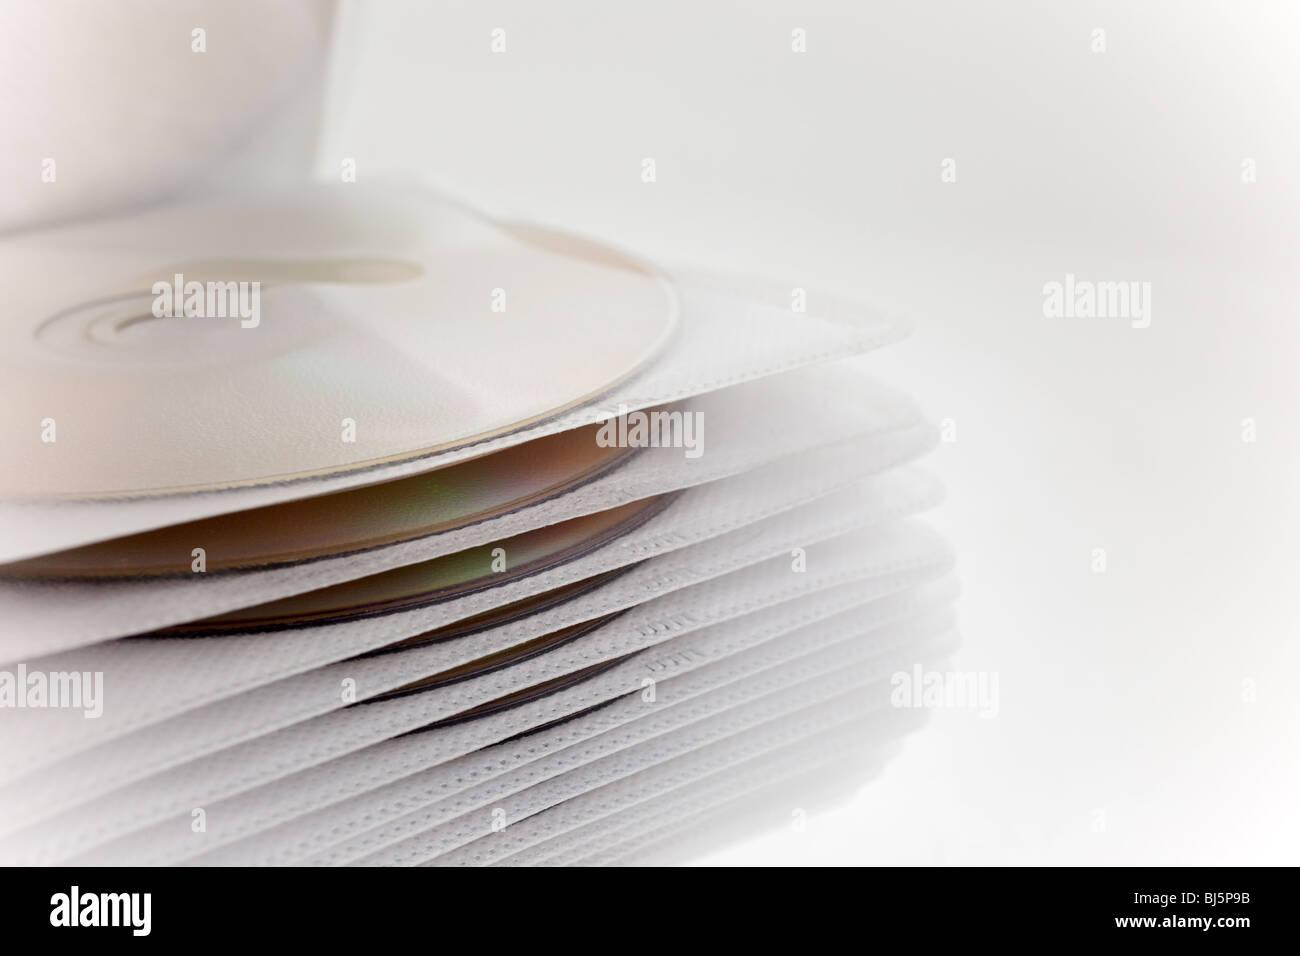 Carcasa de plástico con closeup archivos de disco. Foto de stock